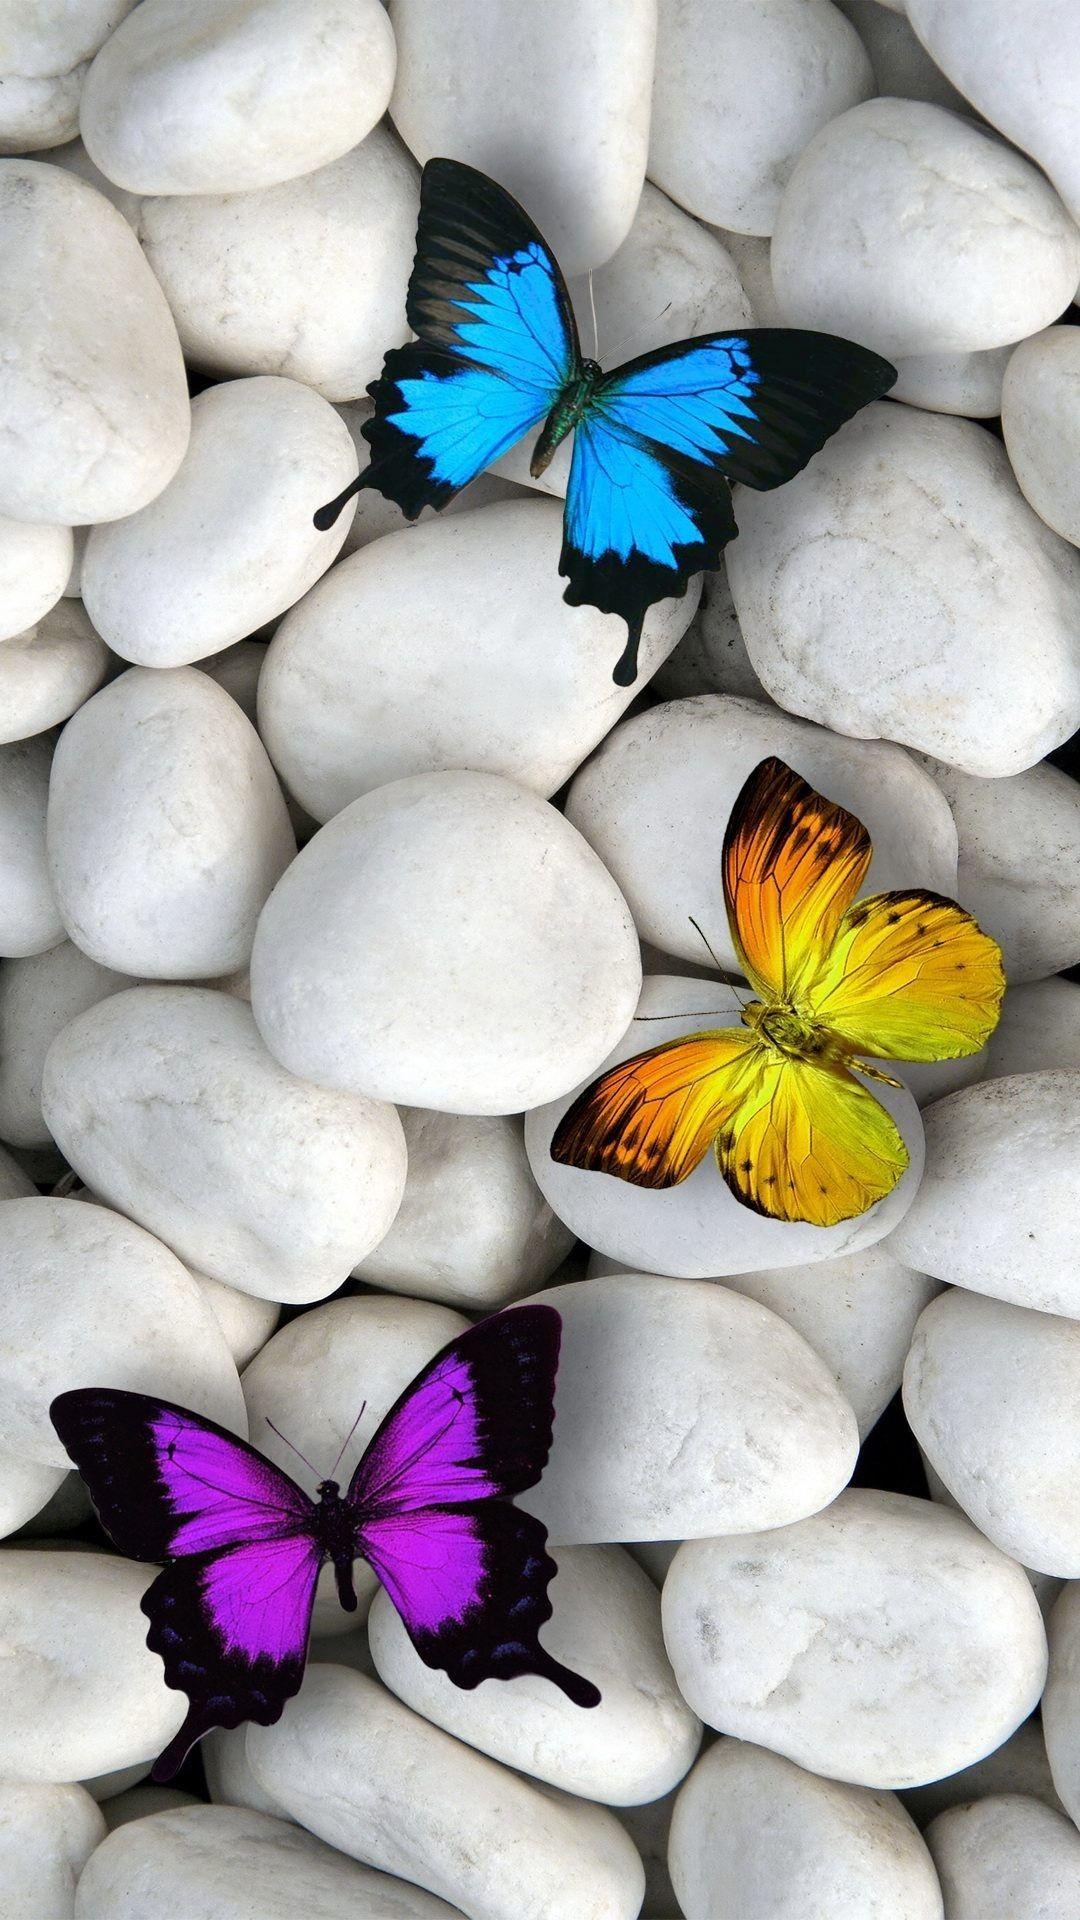 Butterfly Wallpaper Iphone , HD Wallpaper & Backgrounds